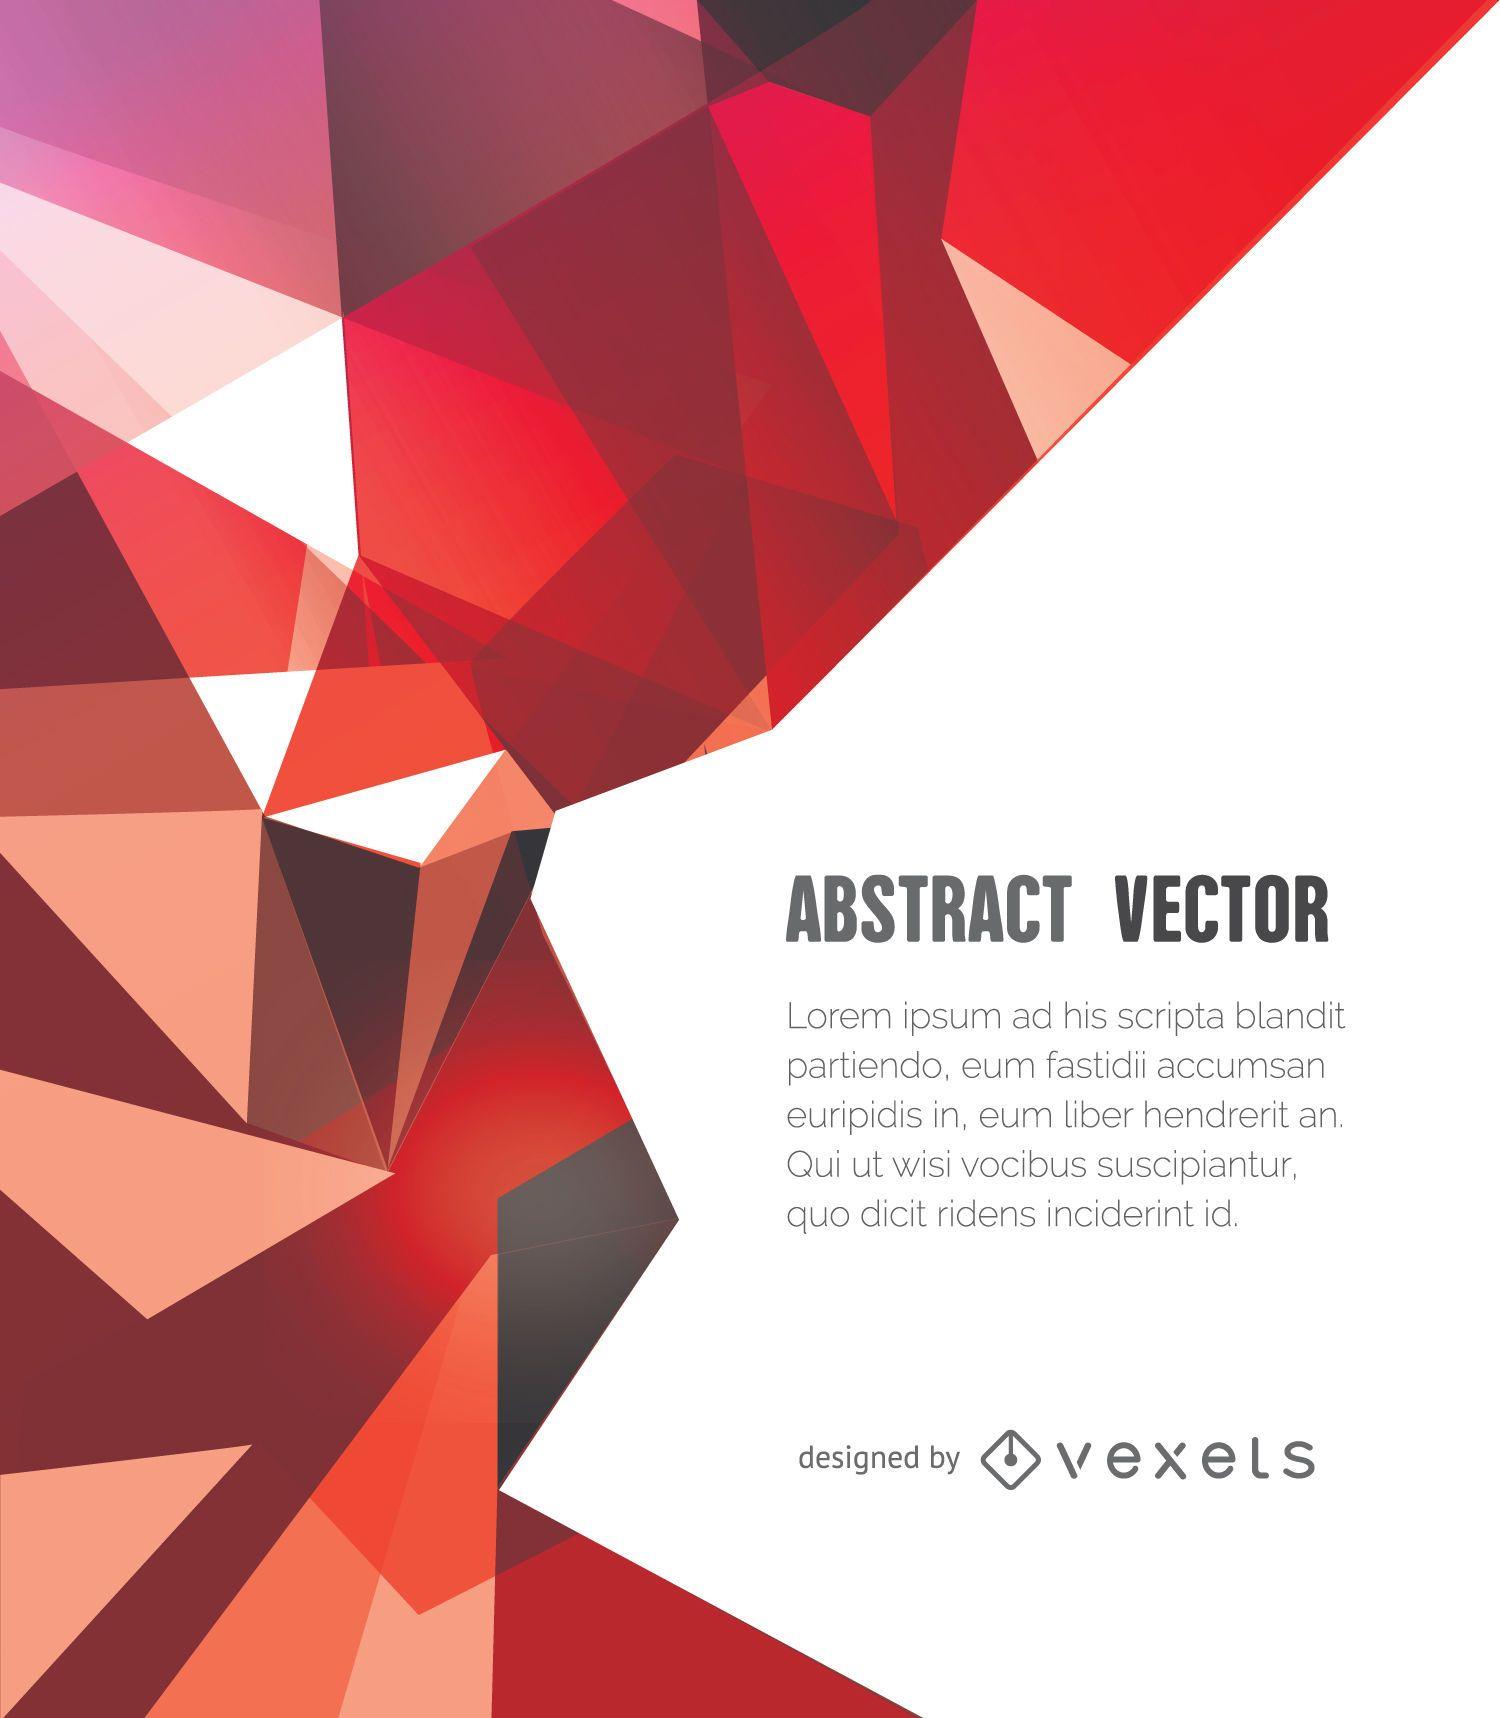 Fondo poligonal abstracto en tonos rojos